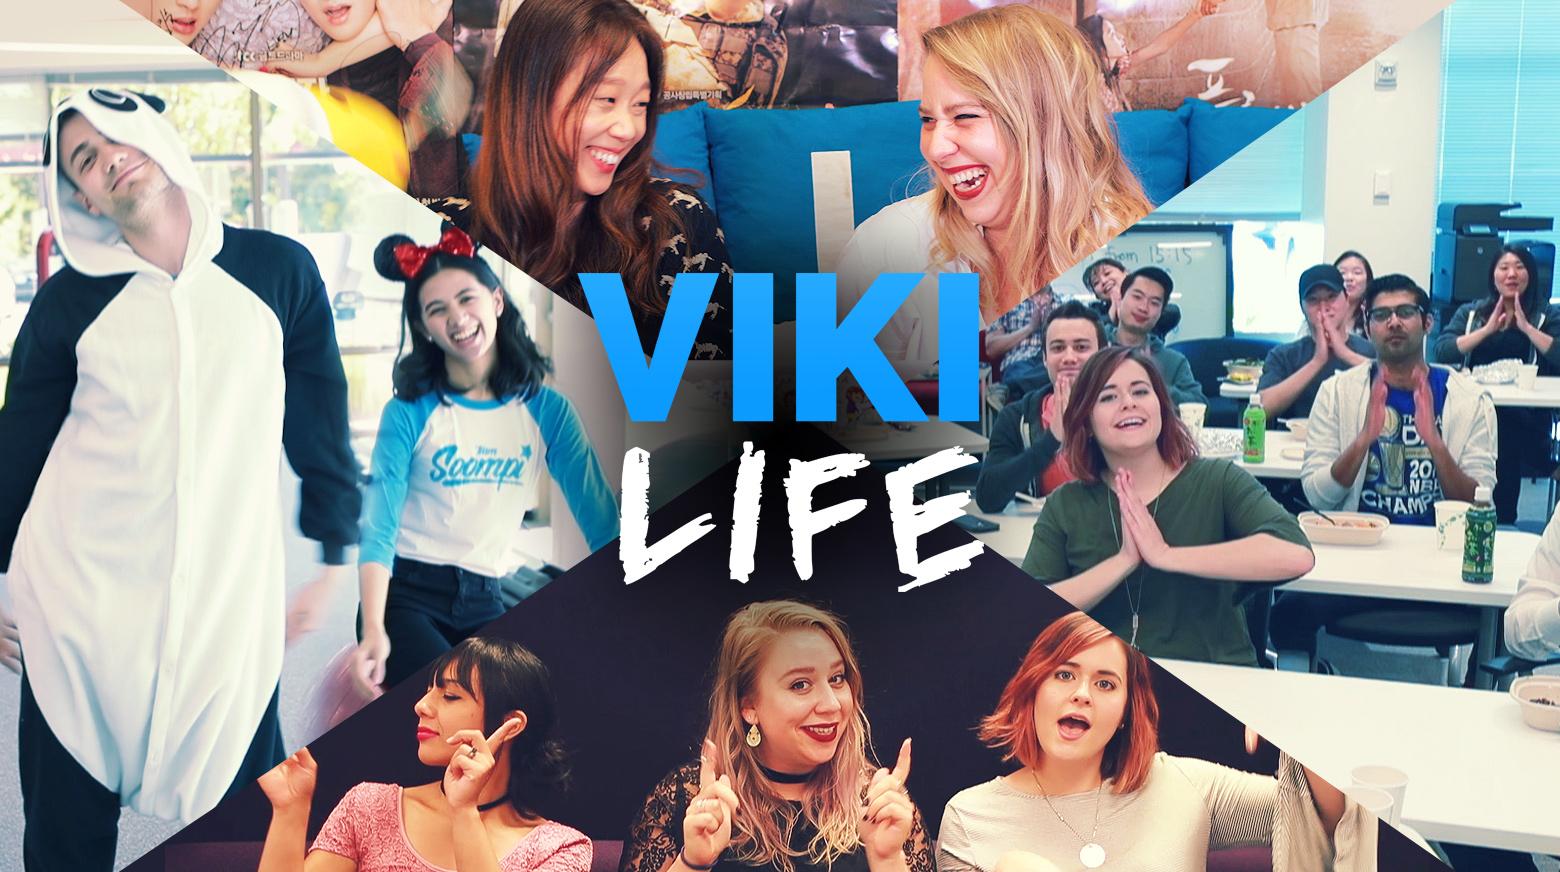 Viki Life